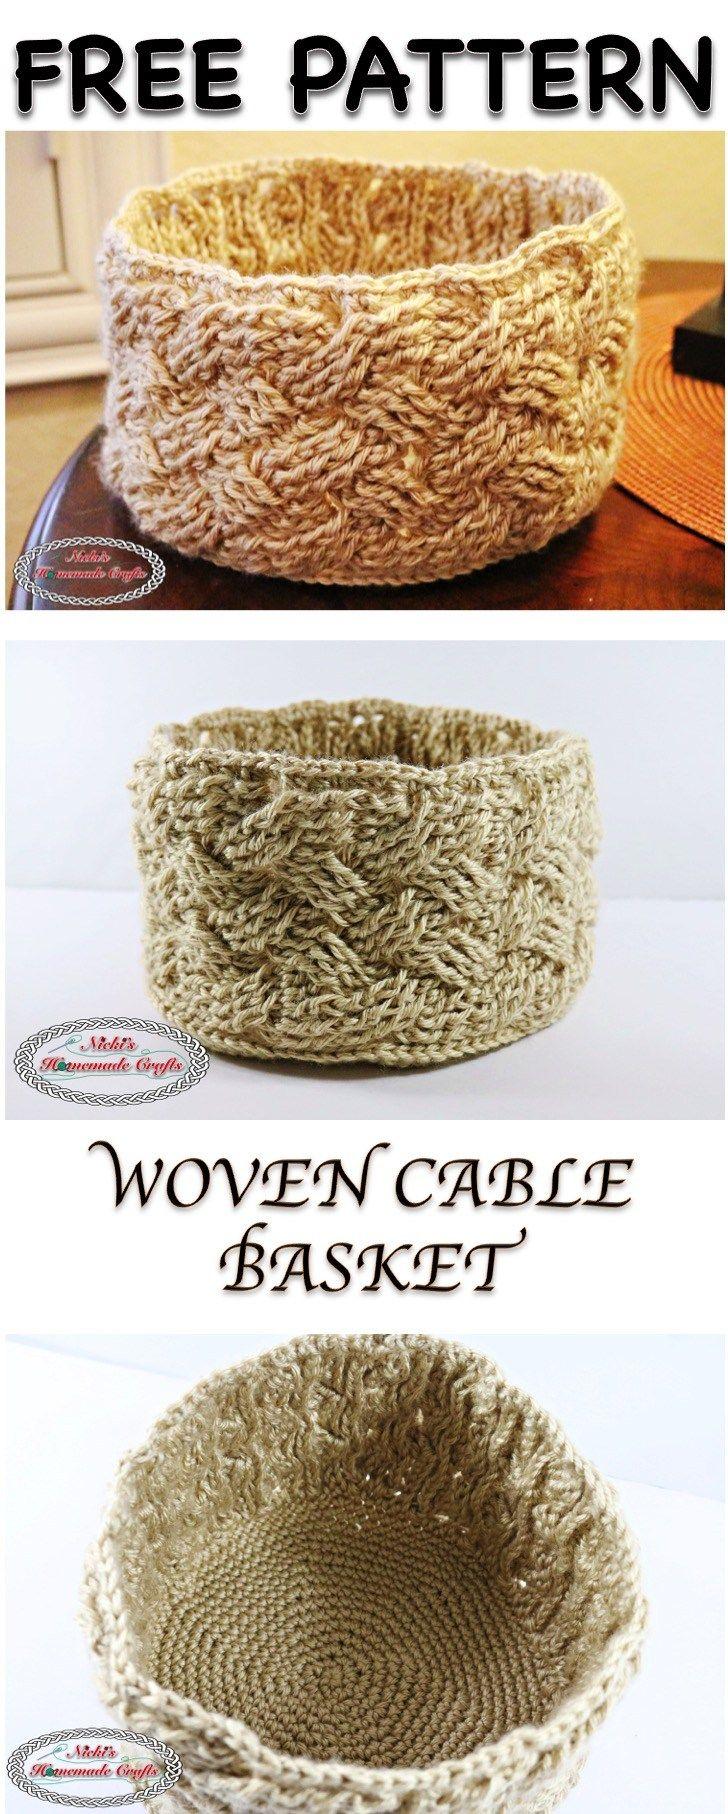 Woven Cable Basket - Free Crochet Pattern